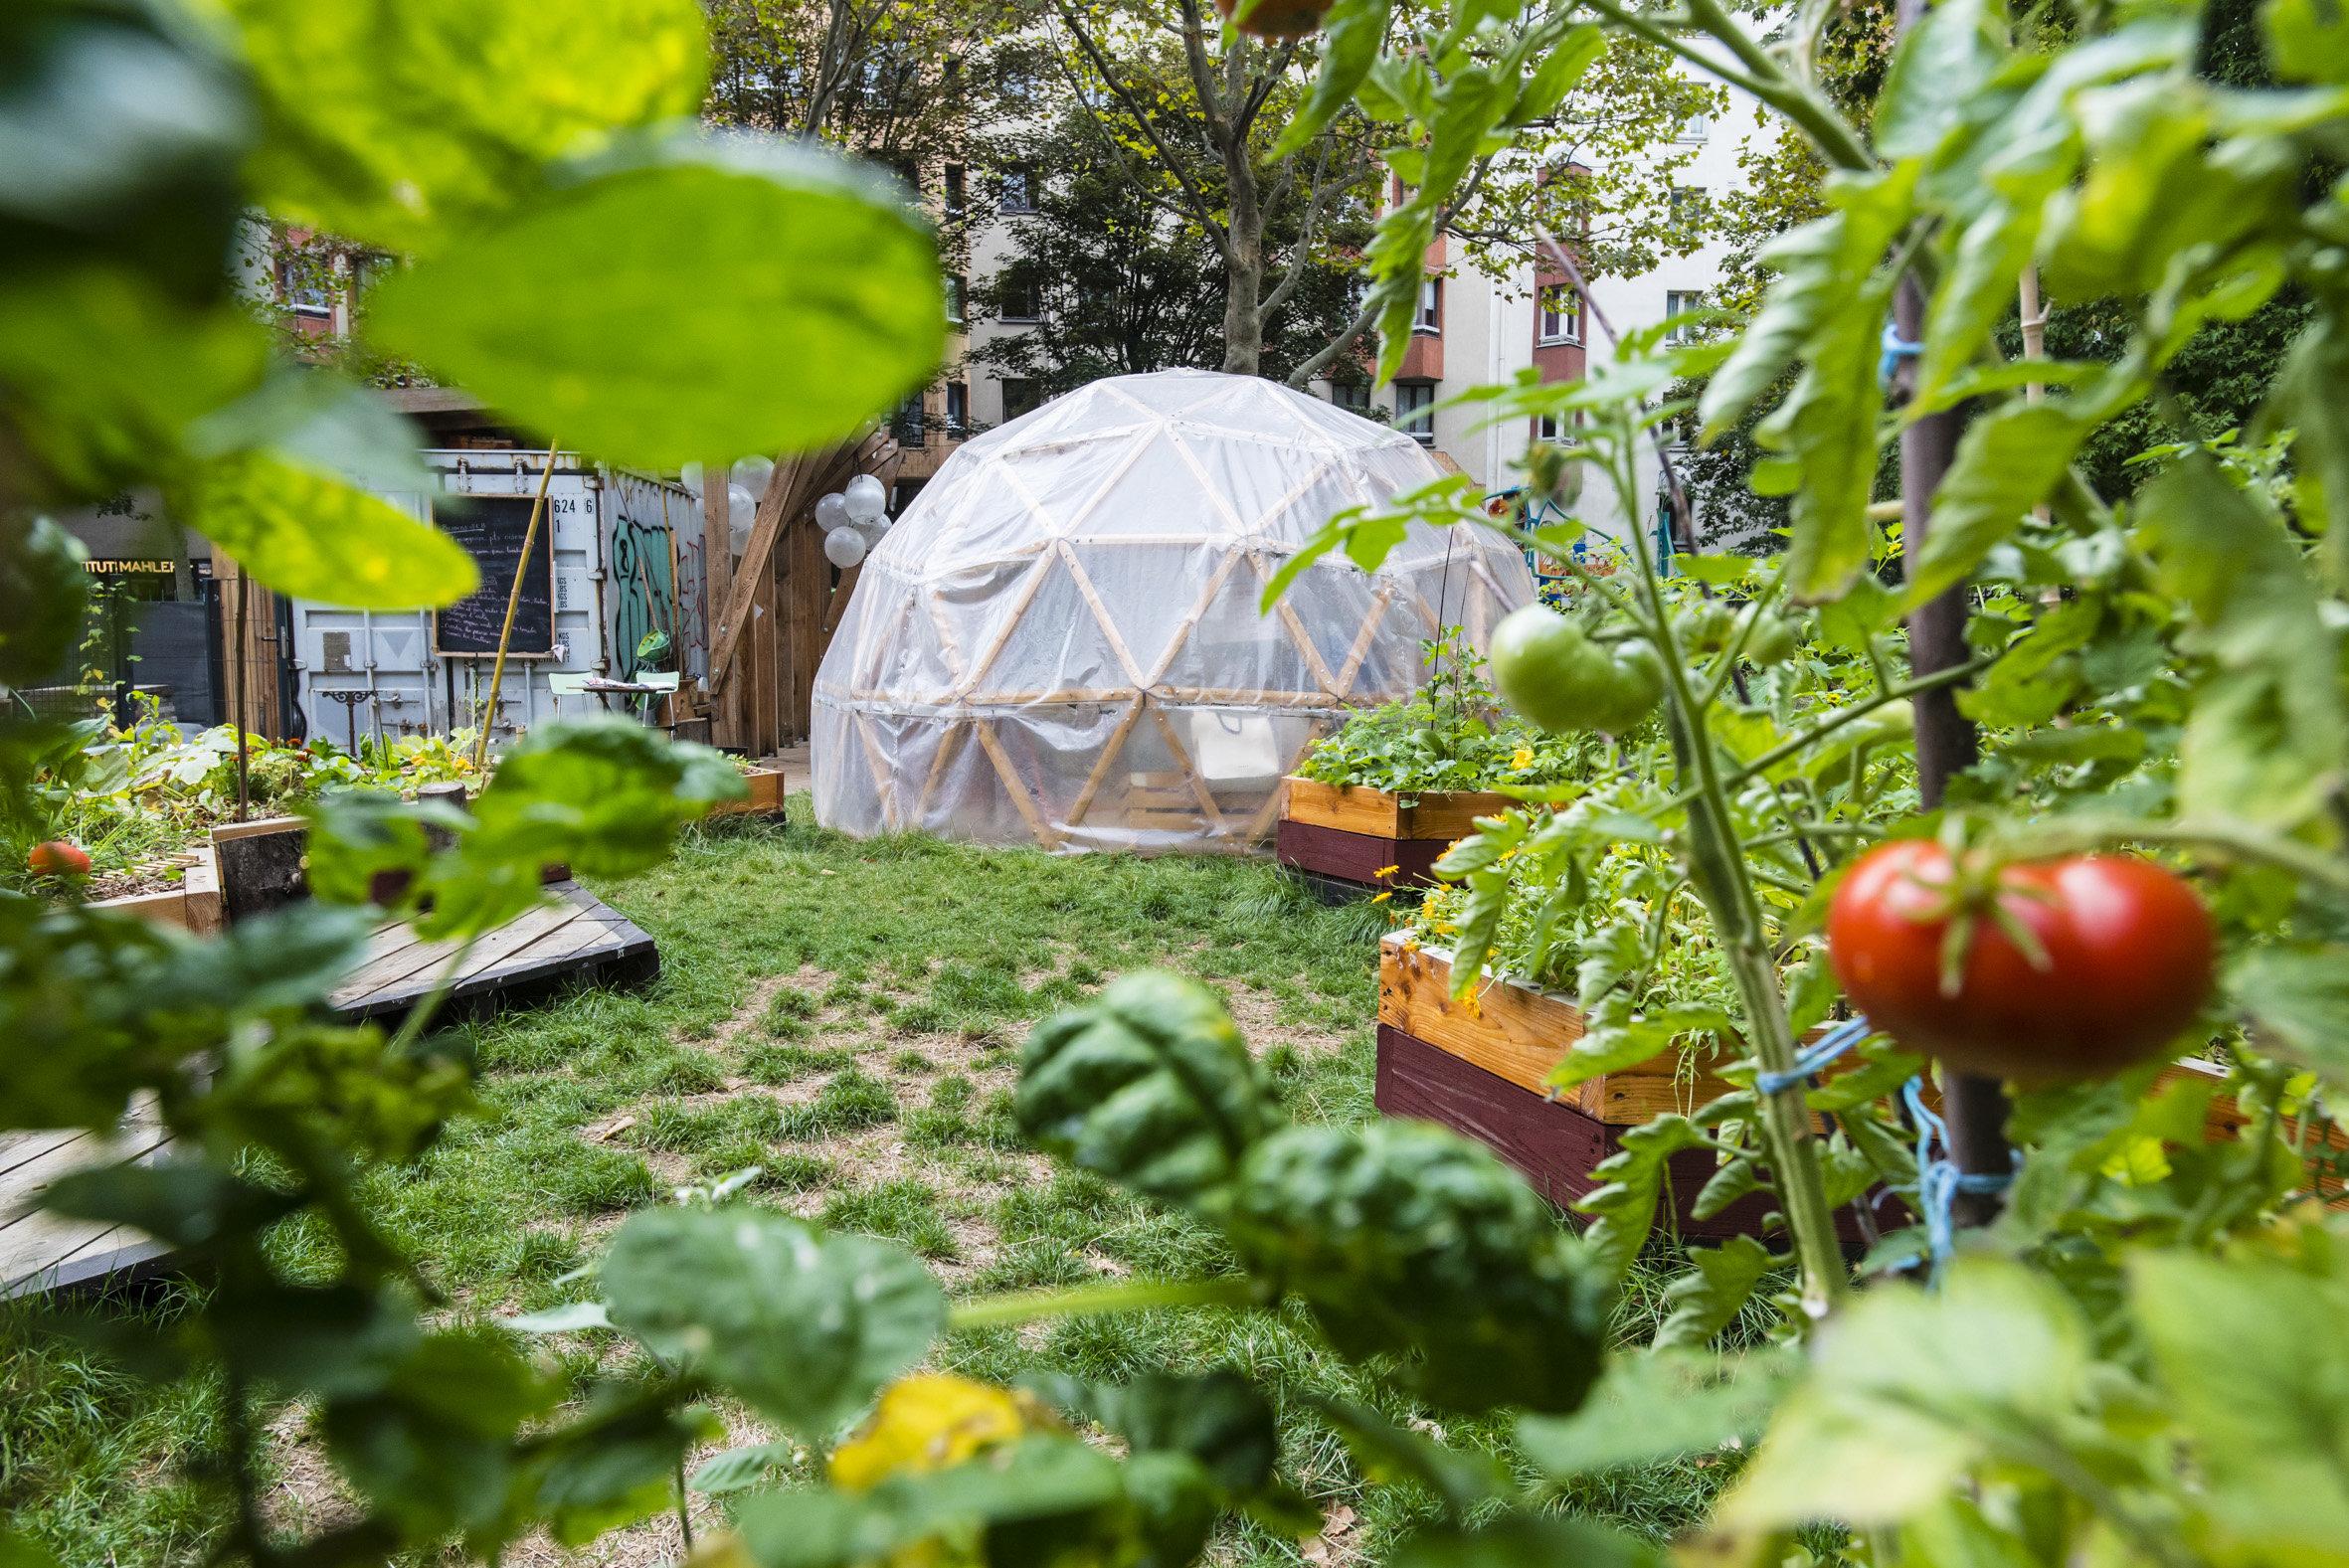 Tomates au premier plan avec serre en forme d'igloo.